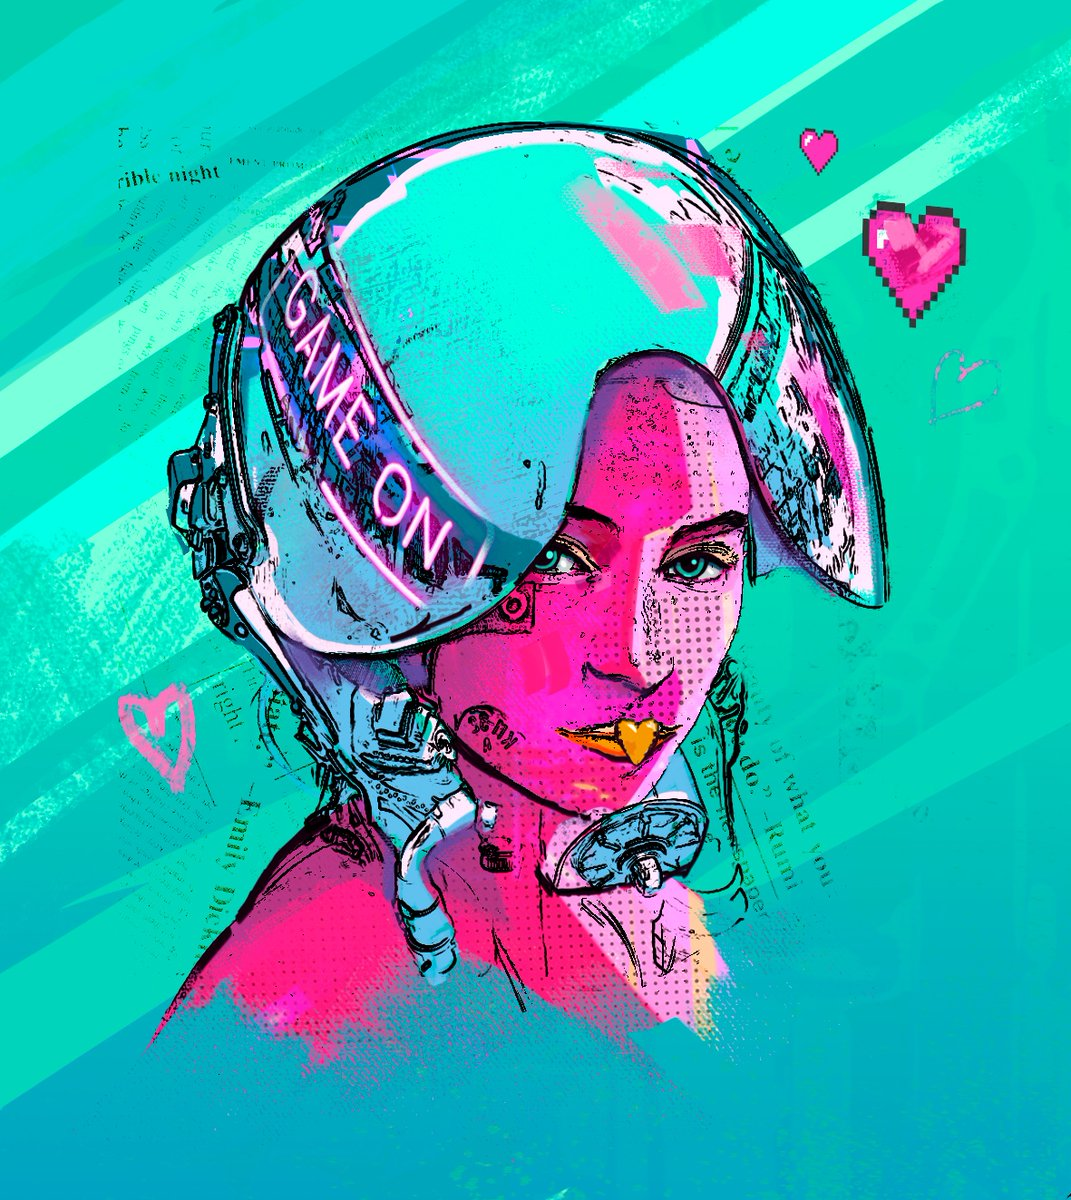 Quick Friday piece. Feeling the Cyberpunk 2077 vibes.  #art #future #digitalart #glitch #instadaily #graphic #anime #industrial #futuristic #futuristicfashion #cybergoth #techwear #cyberpunk2077 #gamer #cyber #scifi #conceptart #futurepunk #gaming #cyberpunk